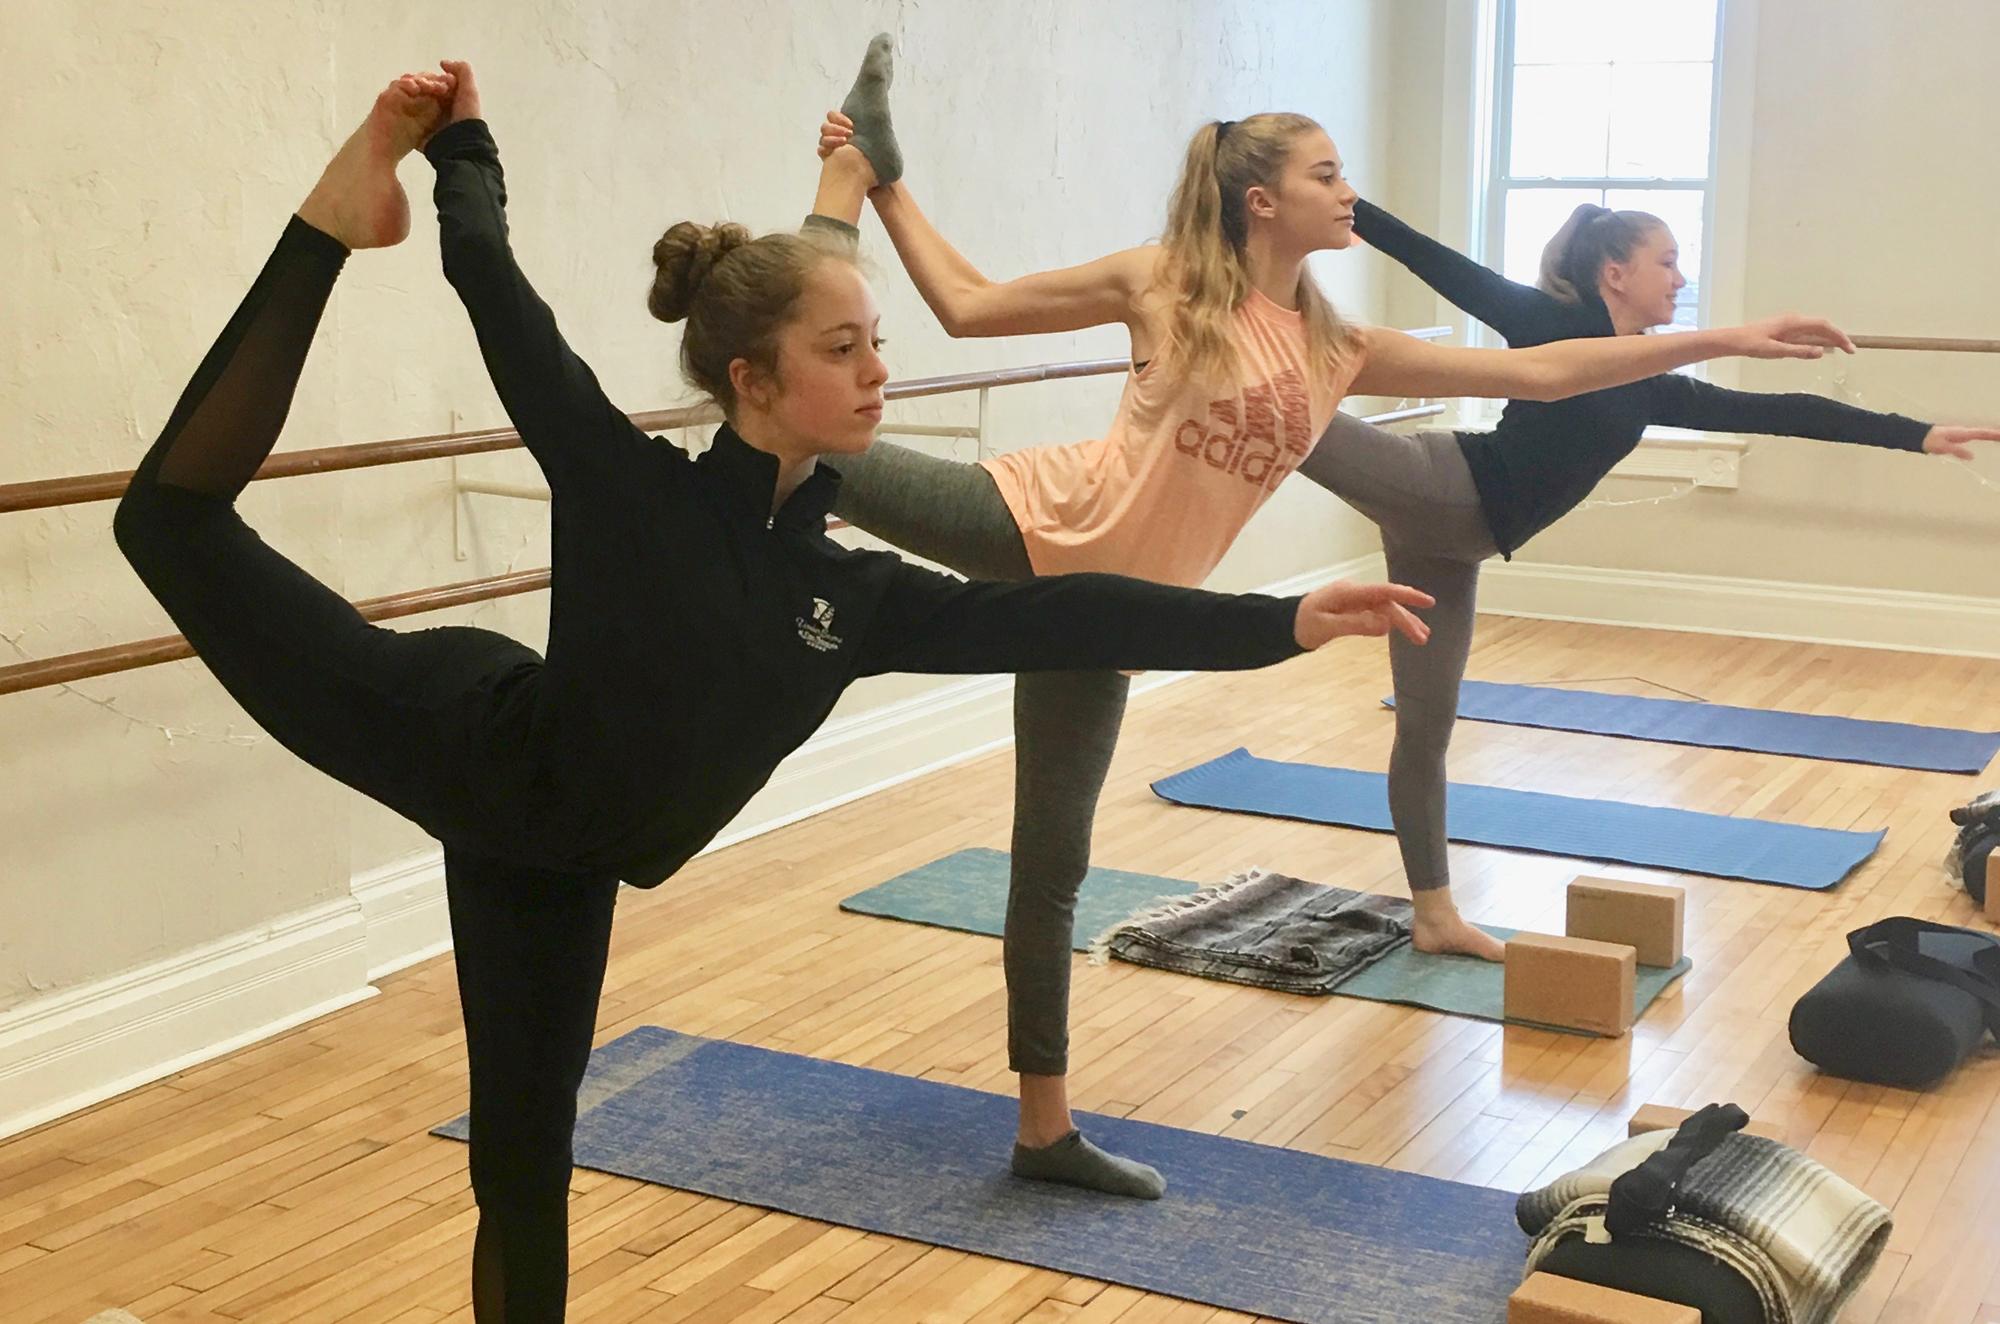 Three women in a yoga class